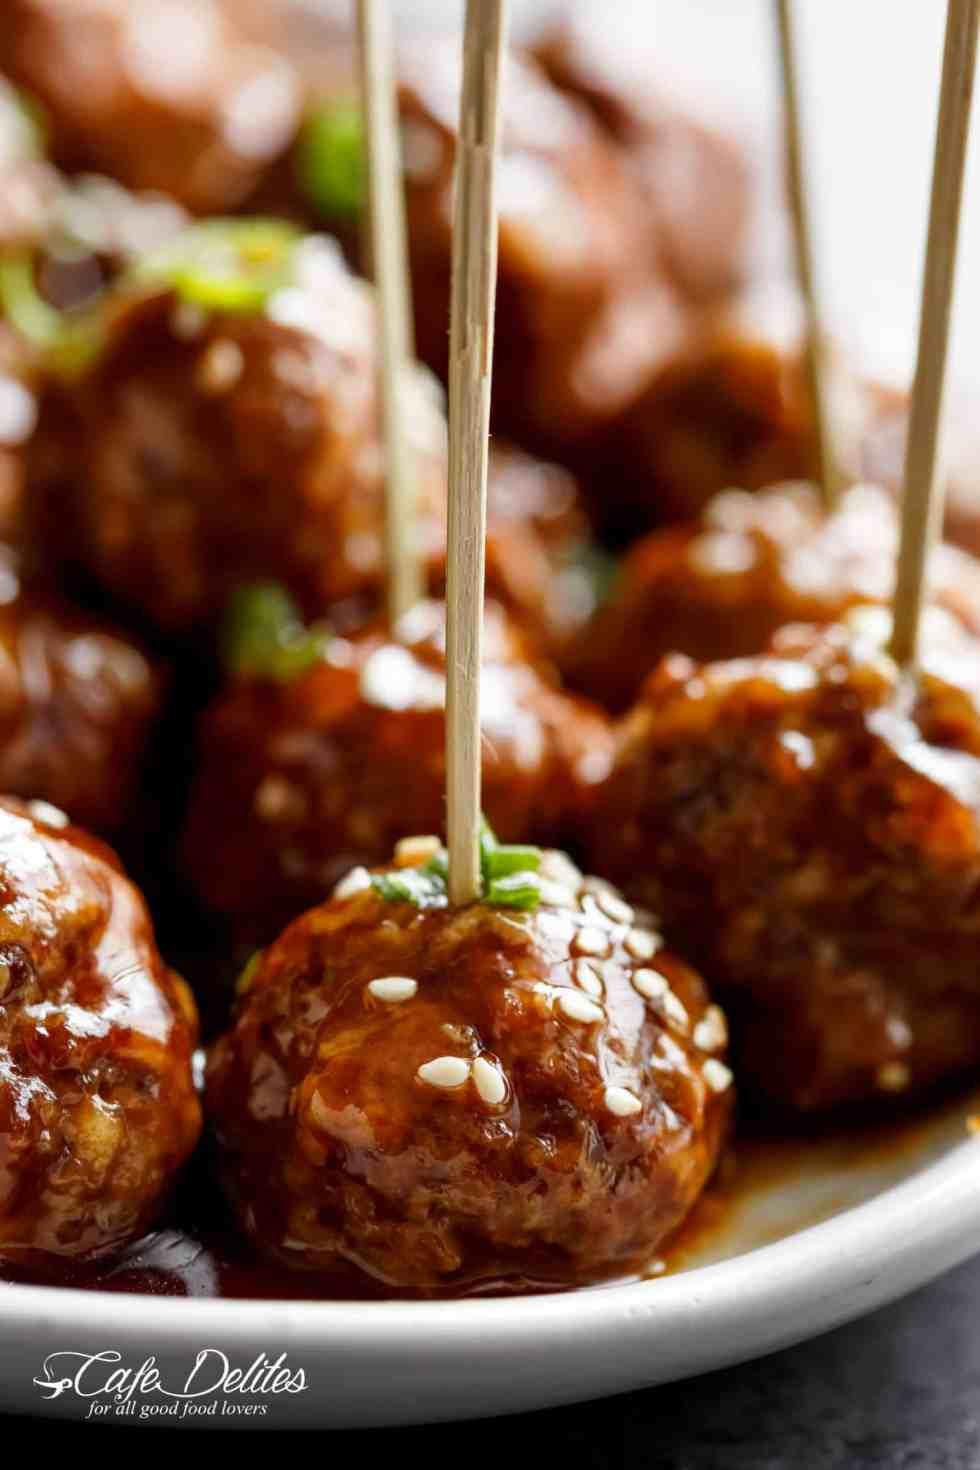 The Best Teriyaki Beef Meatballs Recipe - Cafe Delites